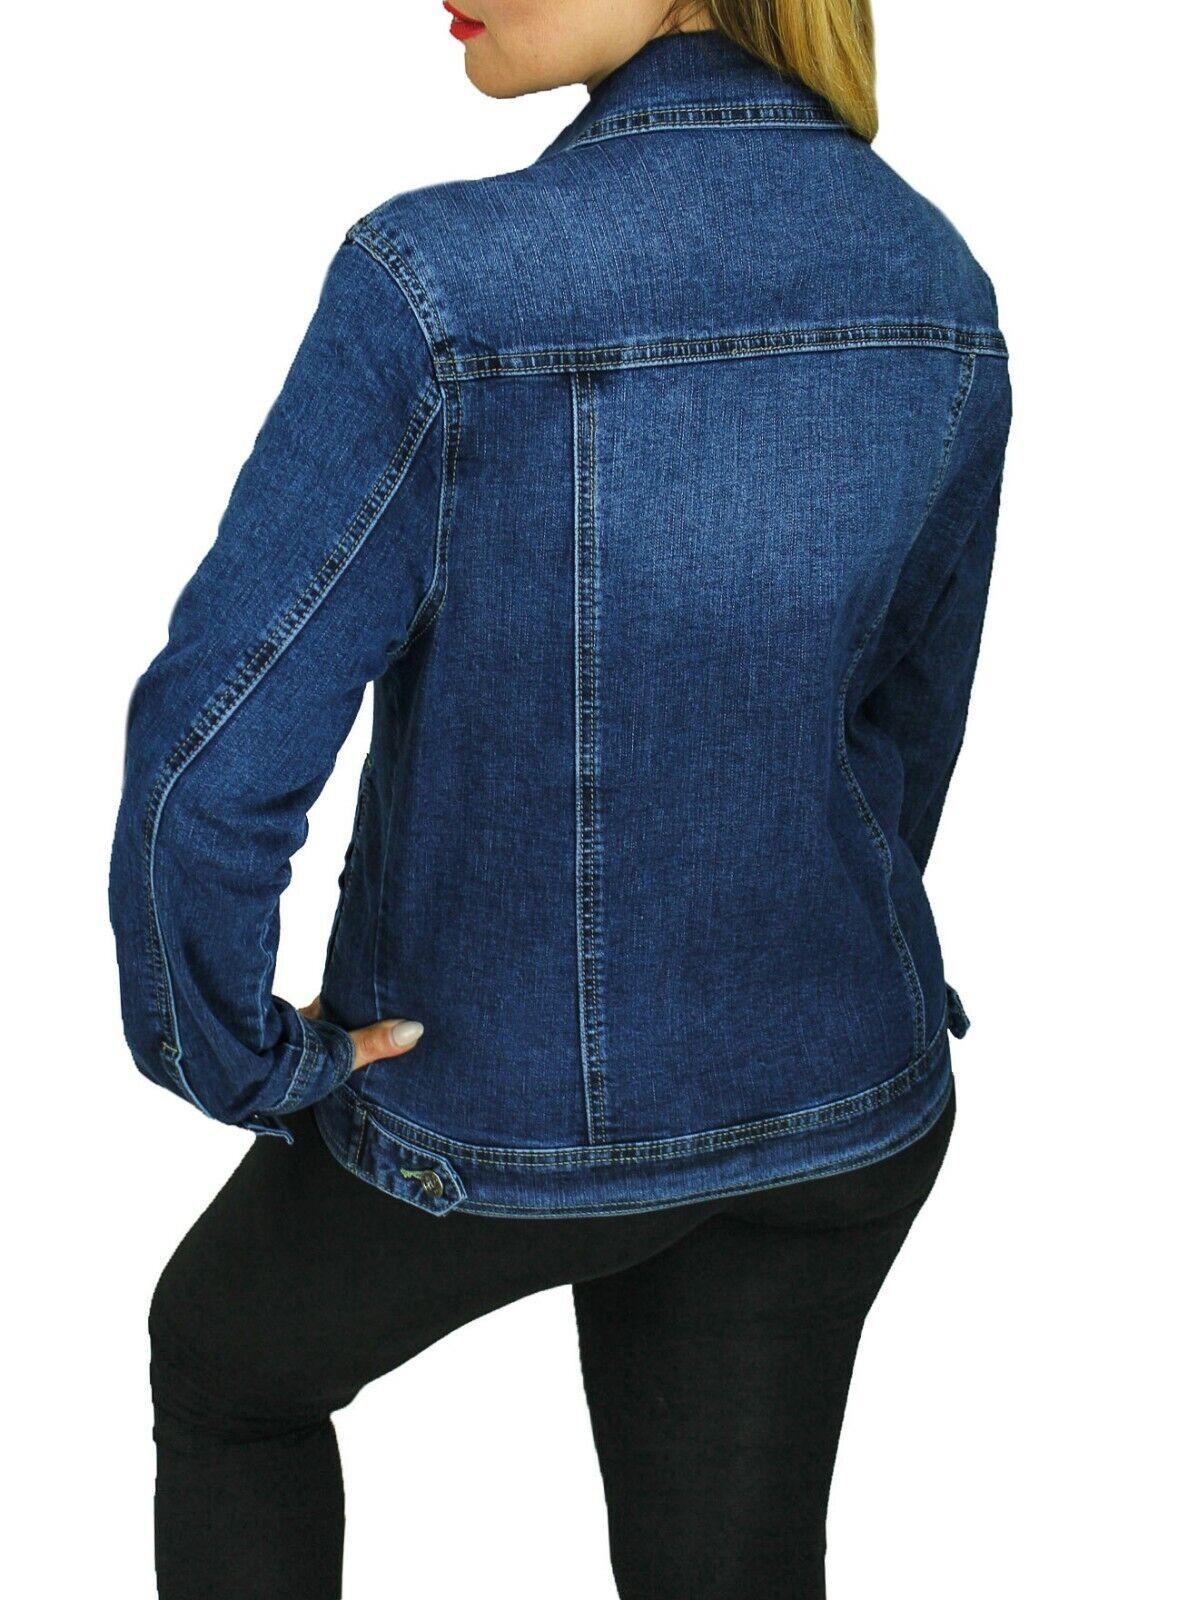 Giacca giubbotto di jeans Diamond donna blu scuro Basic giubbino tessuto denim